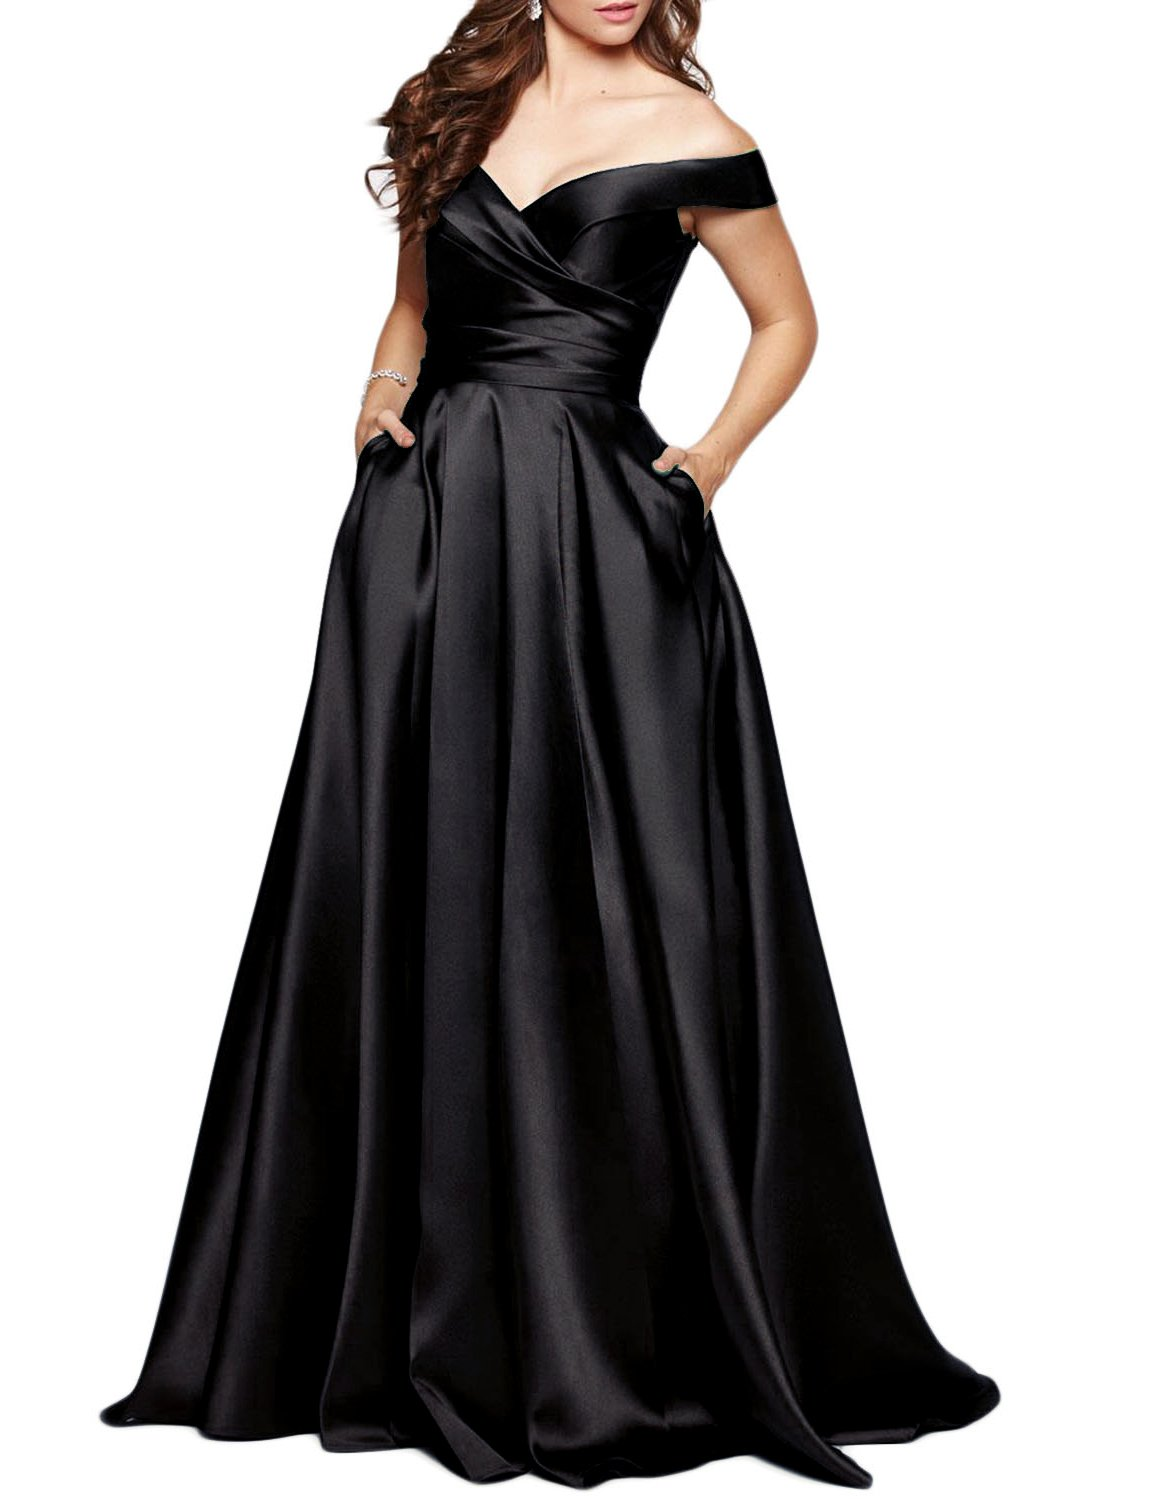 BEAUTBRIDE Women's Off Shoulder Long Prom Dress Evening Gown with Pocket Black 12